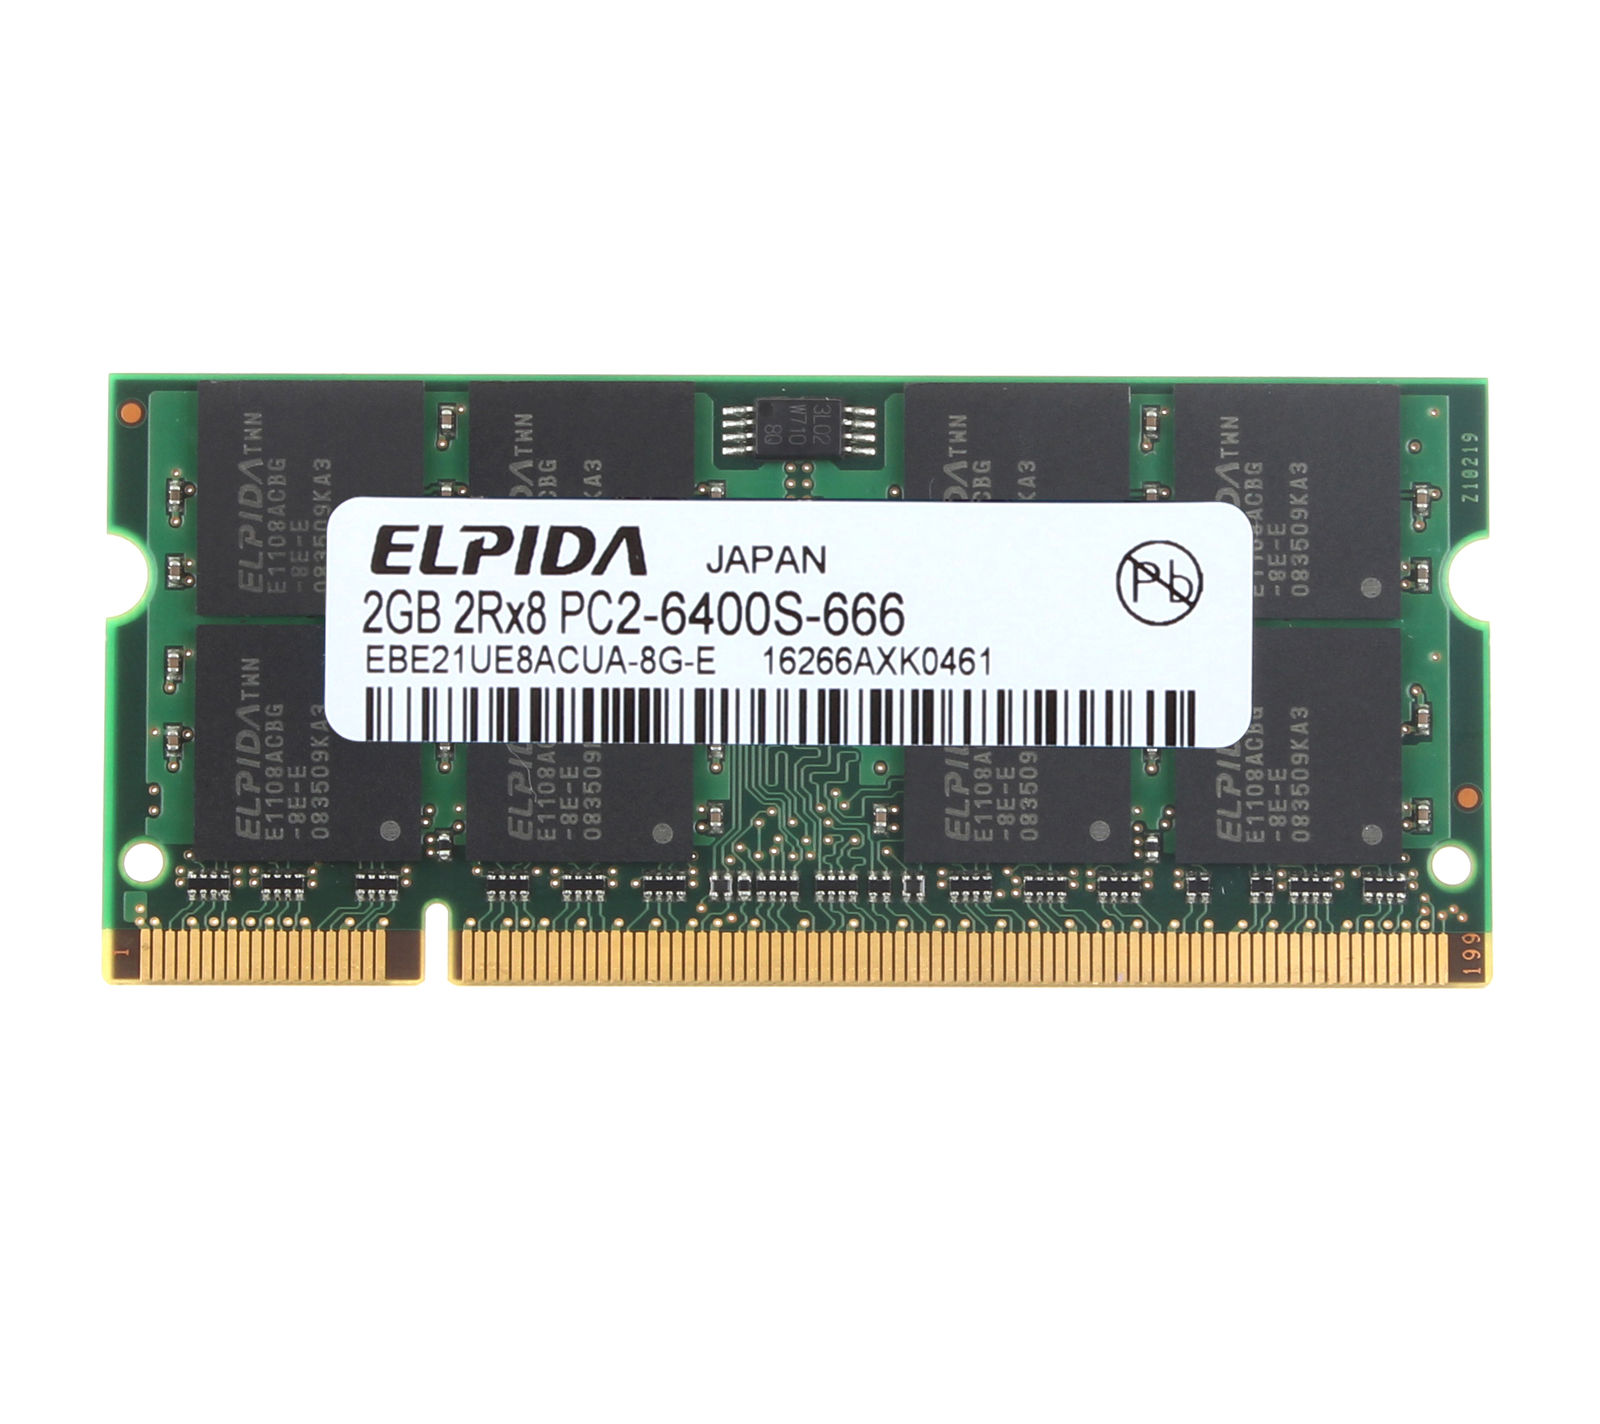 For Kingston 1GB DDR1 400MHz PC1 3200 184pin DIMM Desktop Memory RAM aaamujunbin